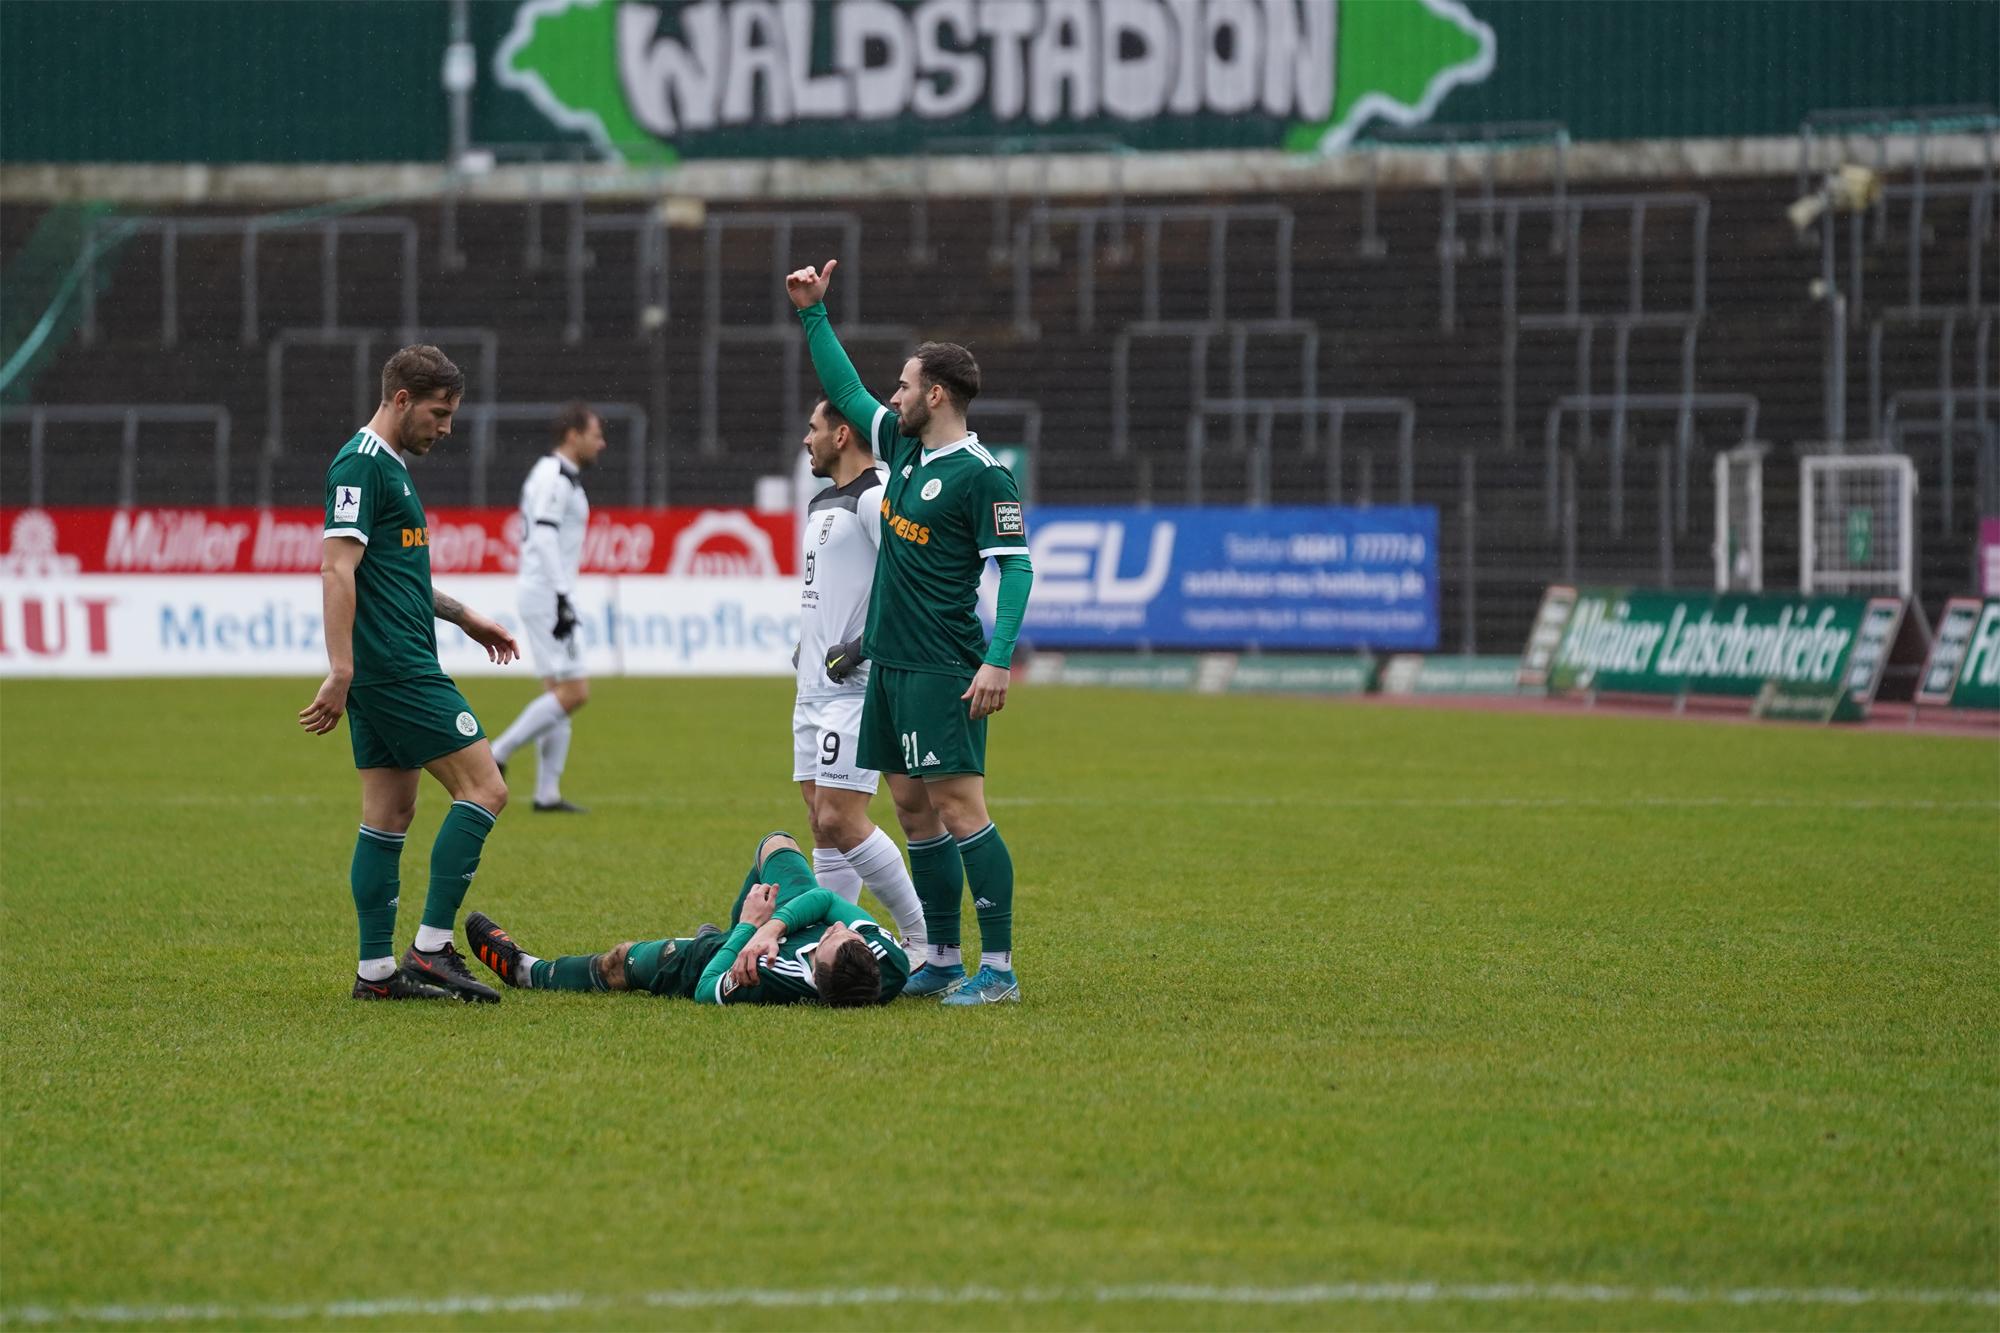 30.01.2021   Saison 2020/21   FC 08 Homburg   SSV Ulm 1846 Fußball